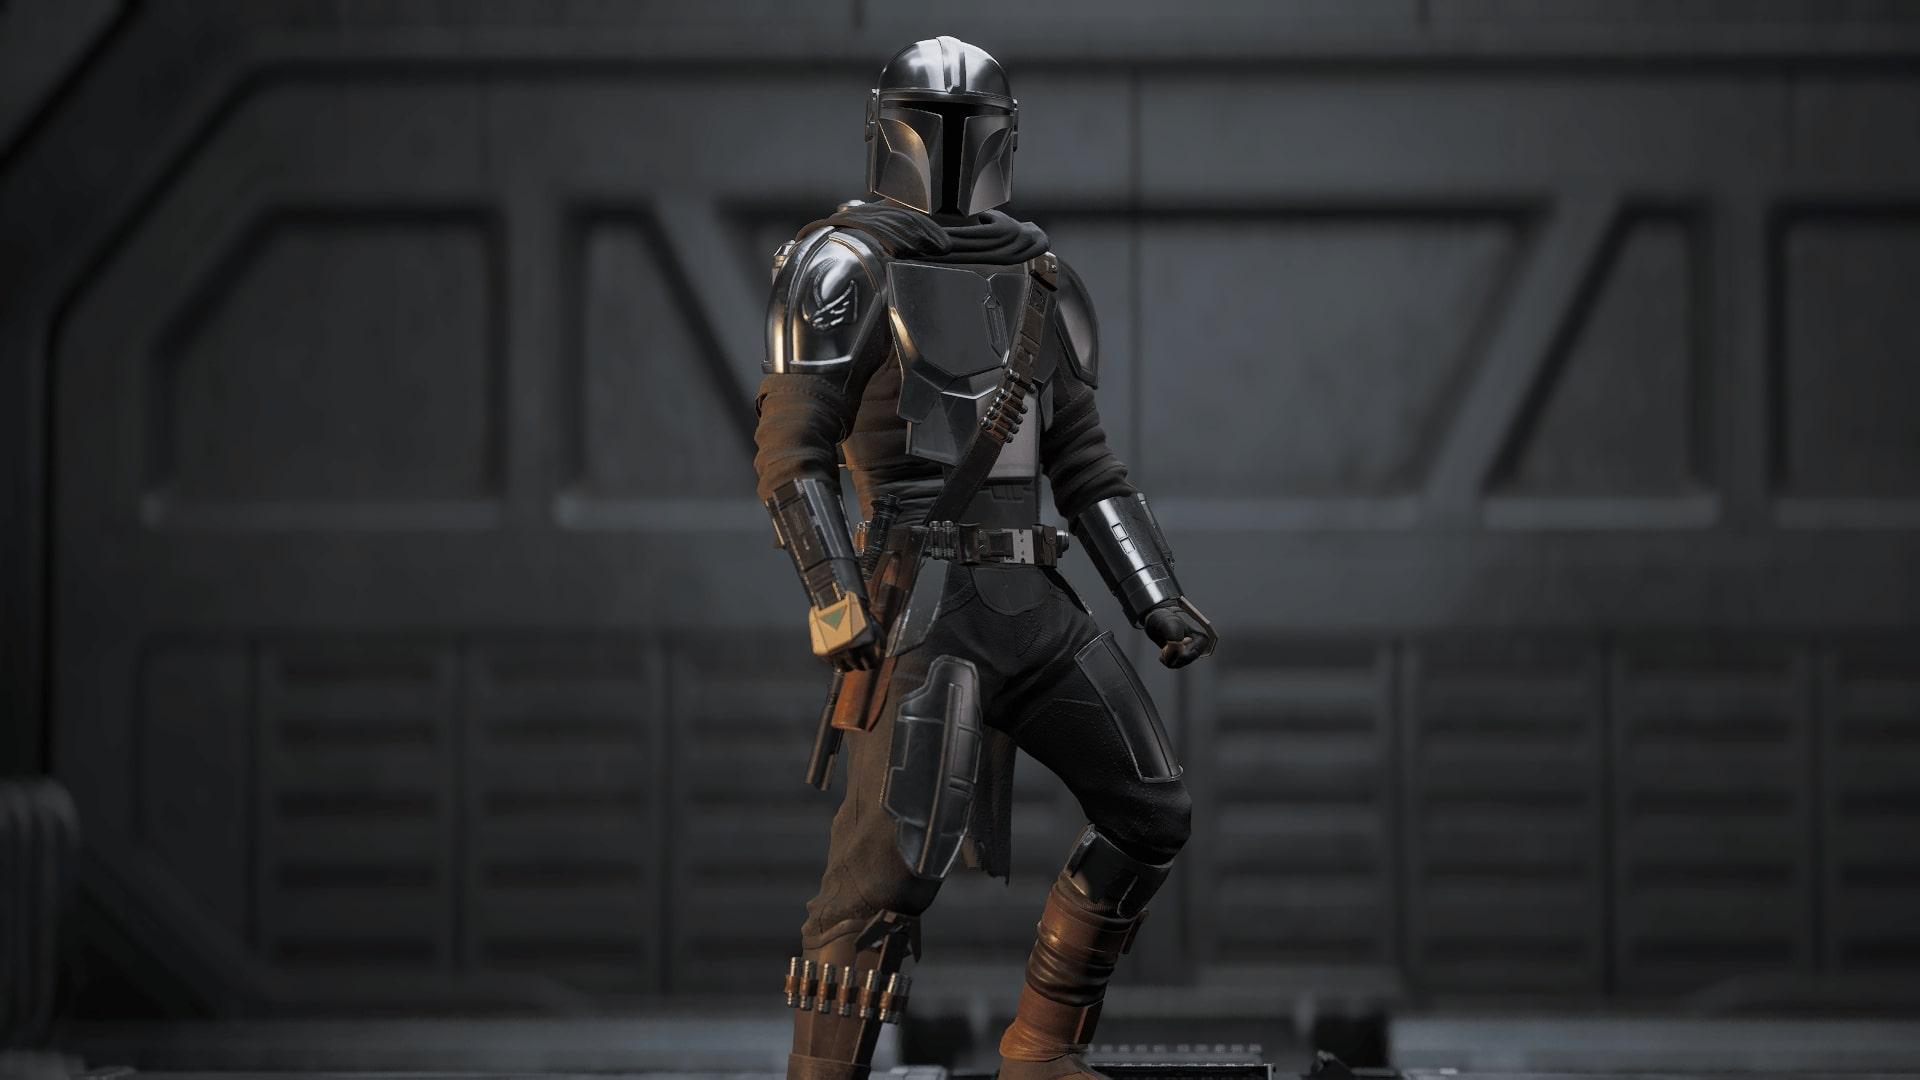 Star Wars Jedi: Fallen Order modders have recreated The Mandalorian